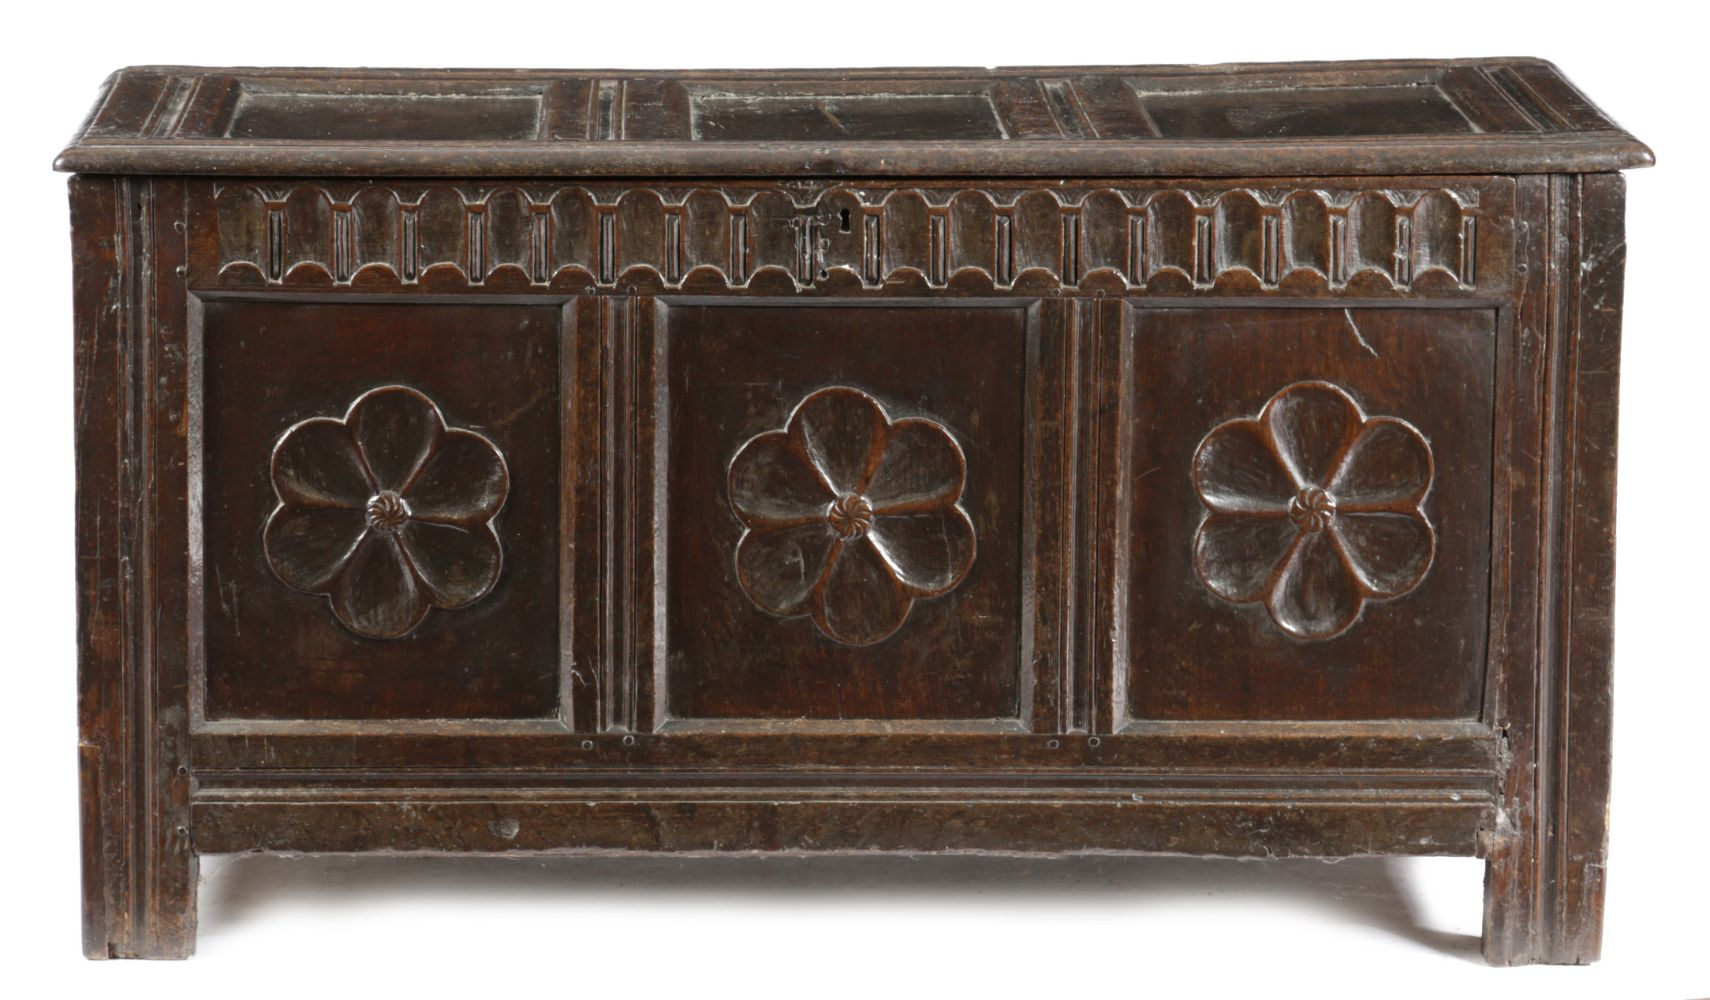 Postponed - New Date TBC- Furniture, Works of Art & Clocks